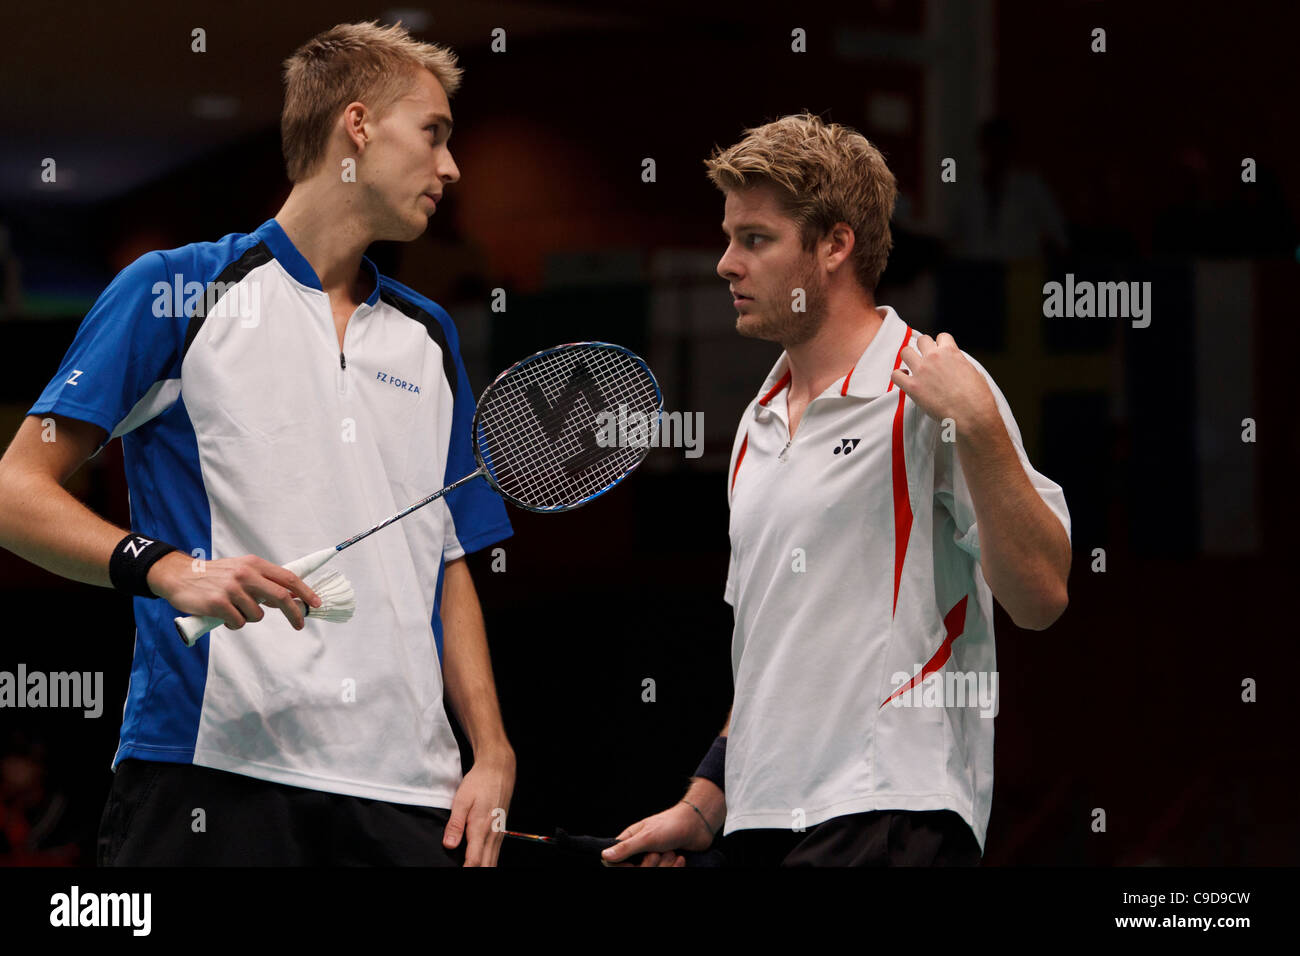 Badminton players Mads Pieler Kolding left and Christian John